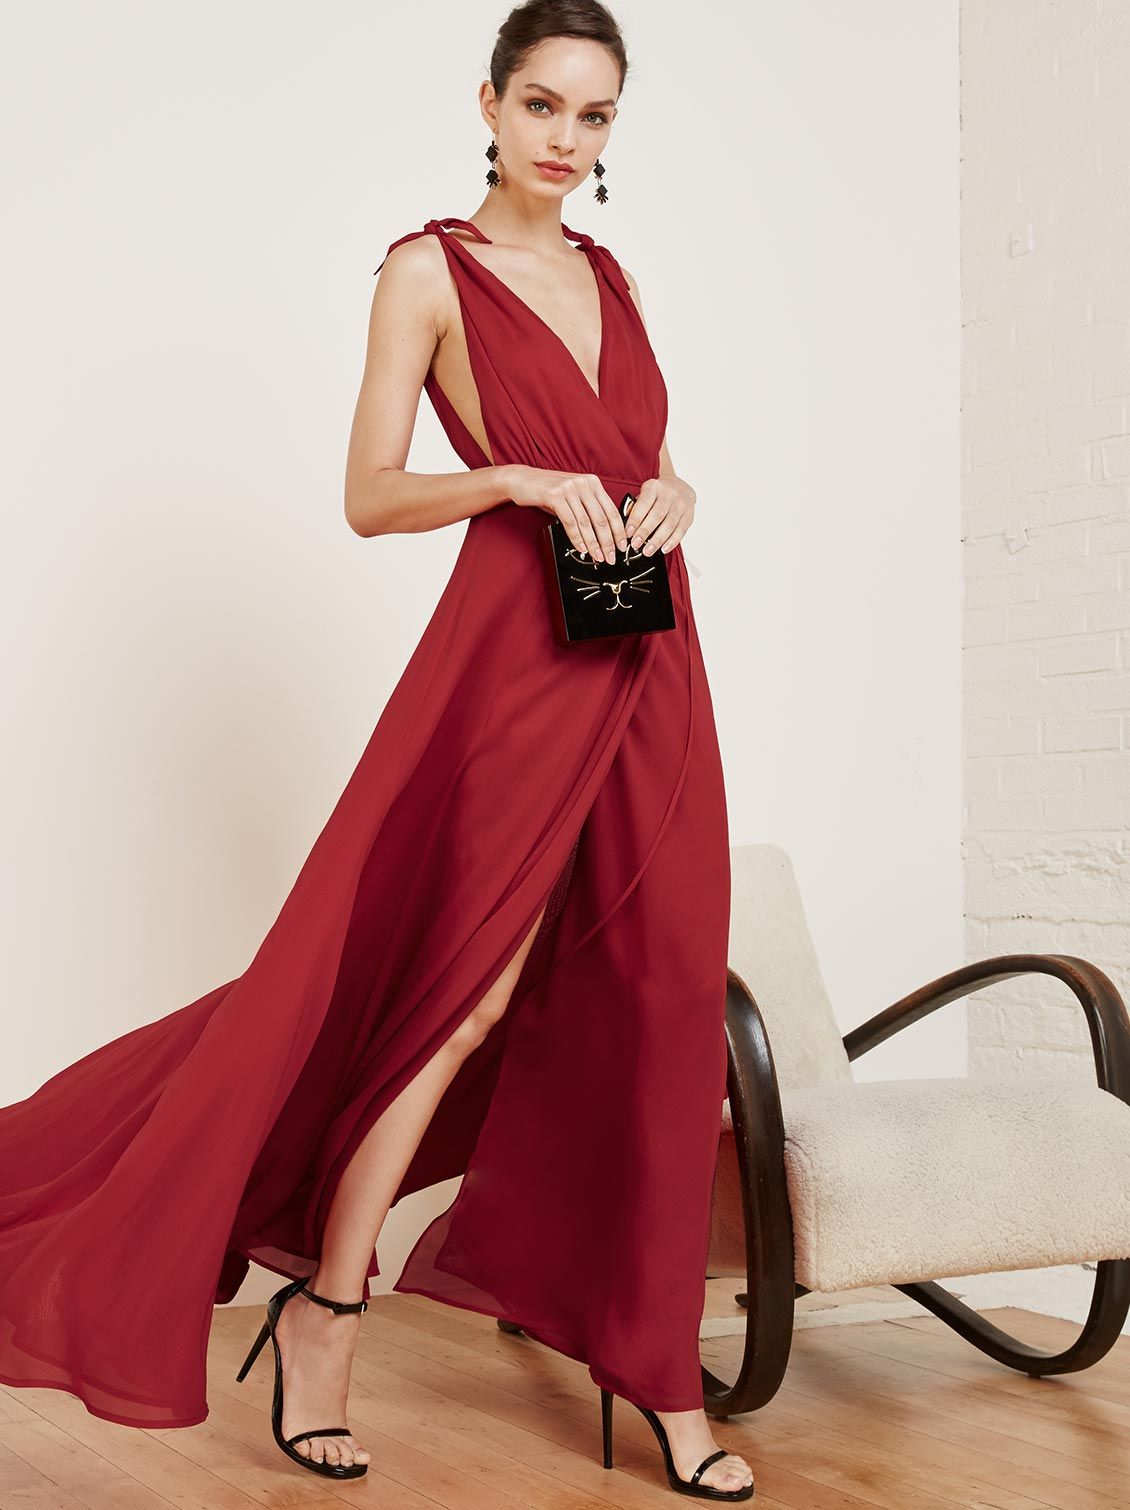 Winslow dress poinsettia prom and fashion